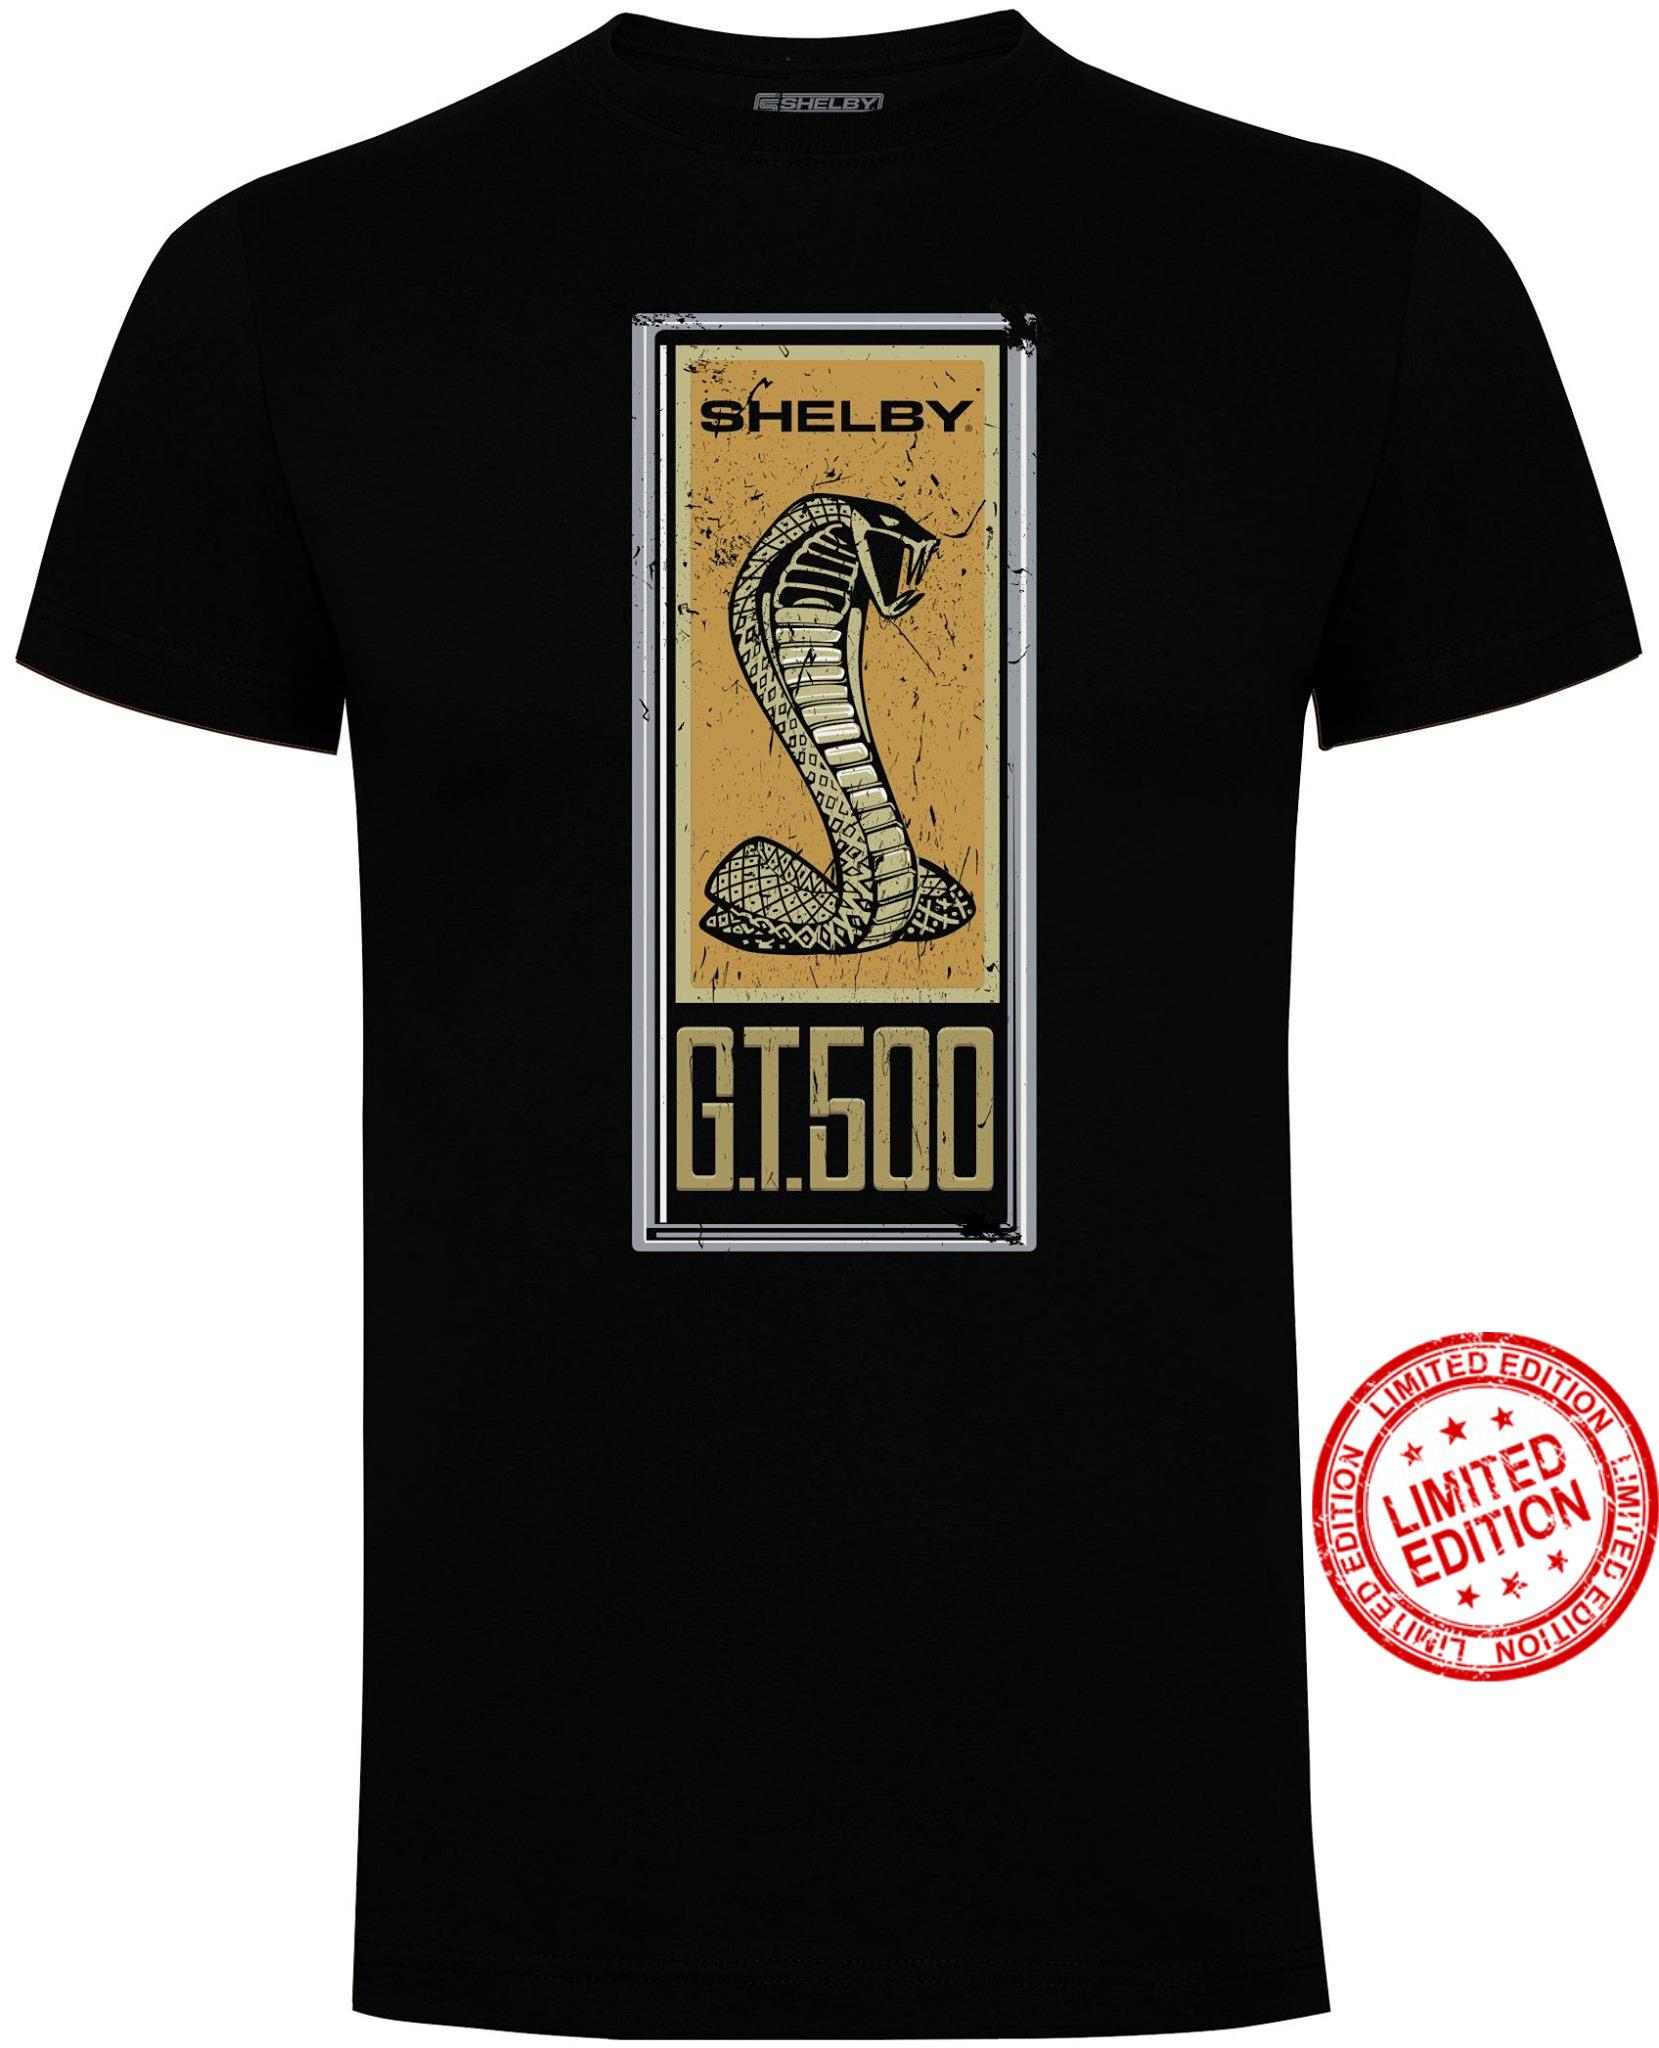 Shelby GT500 Shirt